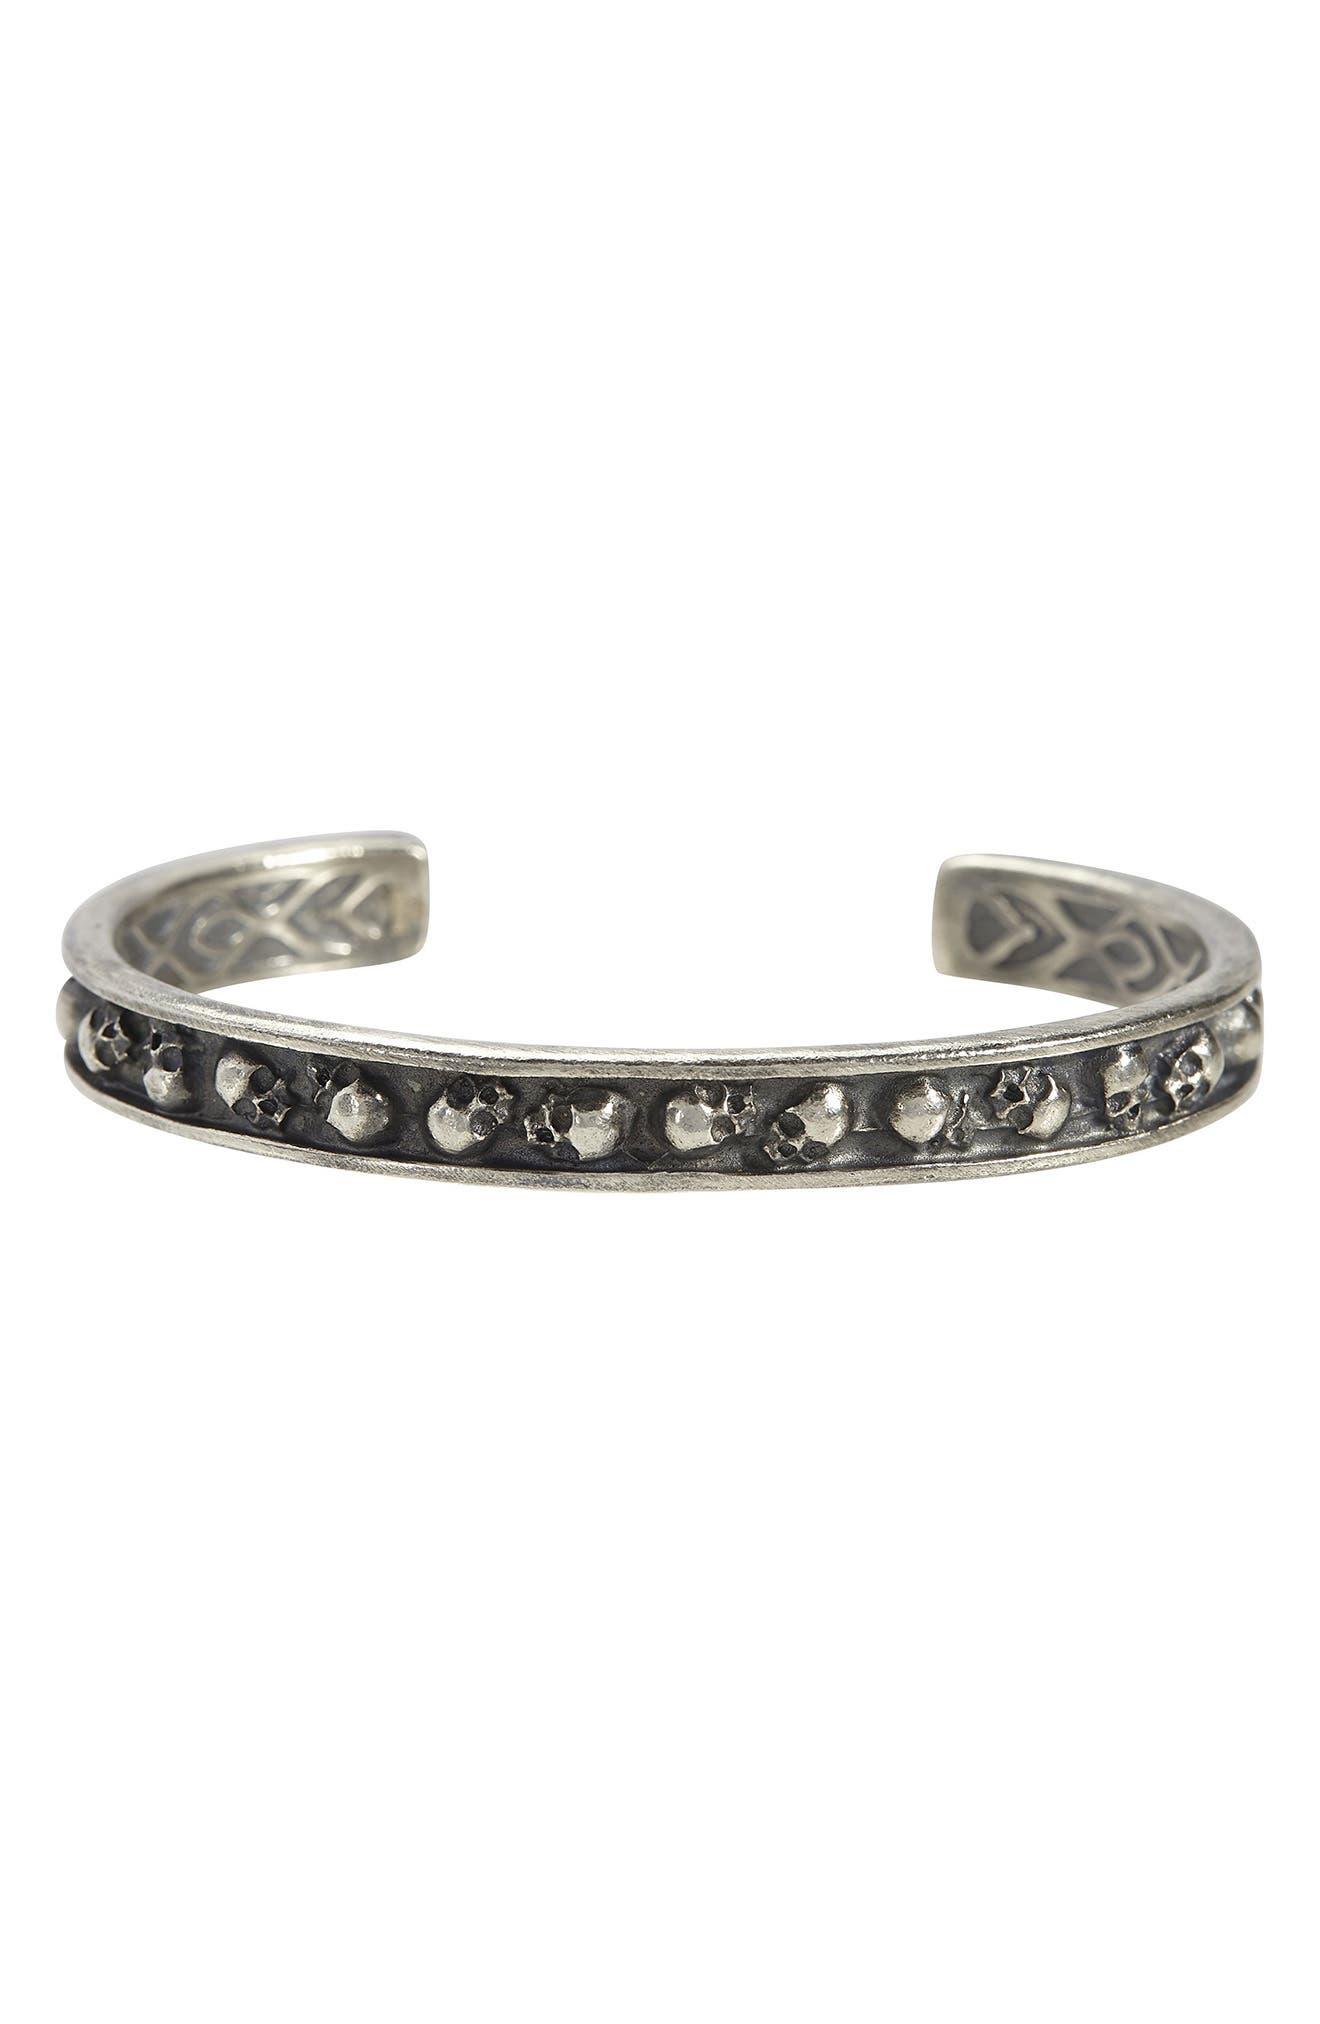 Women's John Varvatos Skull Sterling Silver Cuff Bracelet